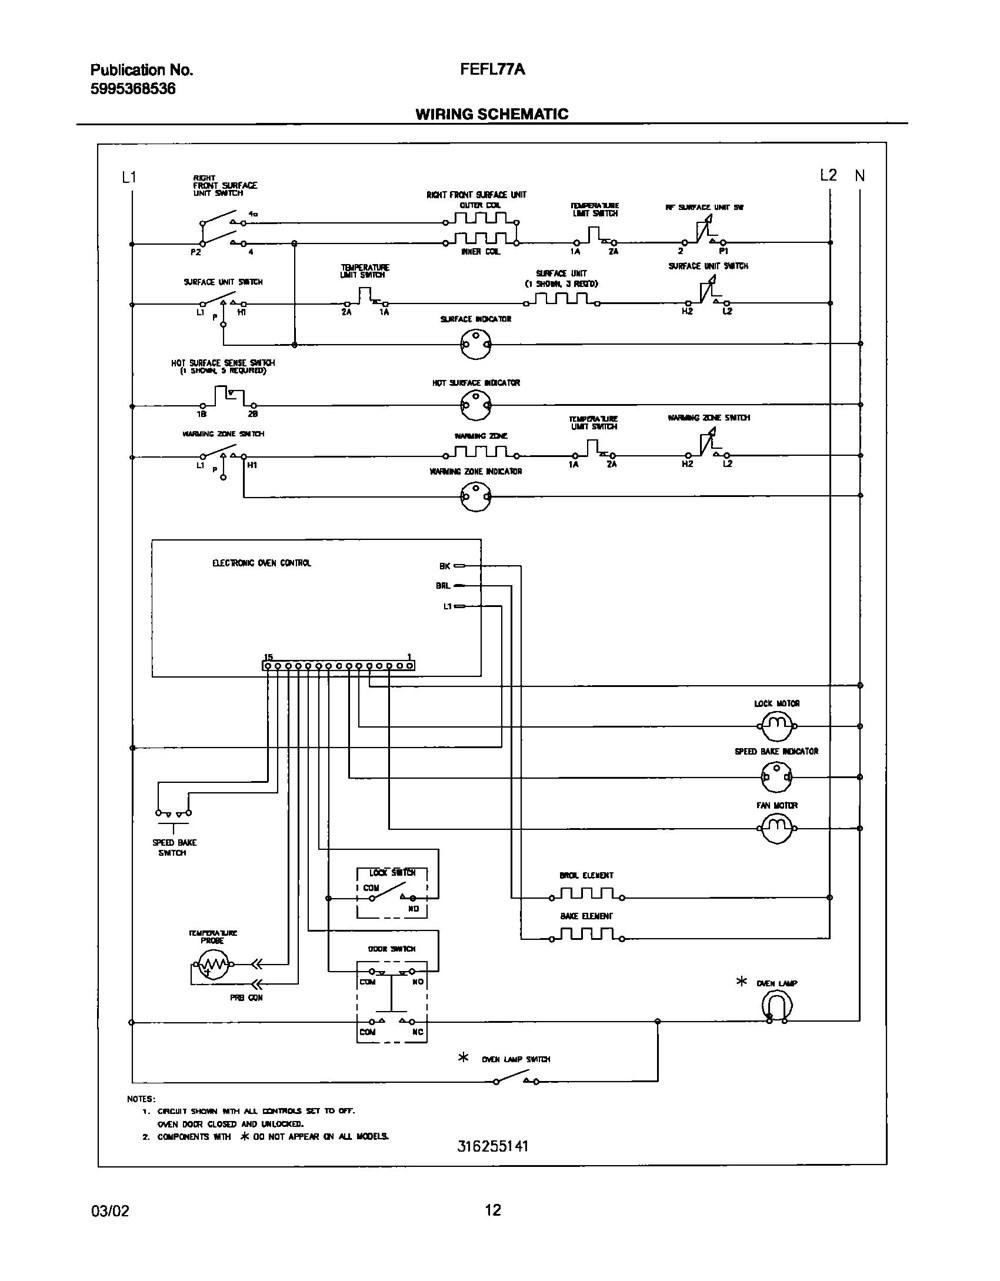 Fefl77abe Frigidaire Company Backguard 05body 07top Drawer 09door 01cover 10wiring Diagram